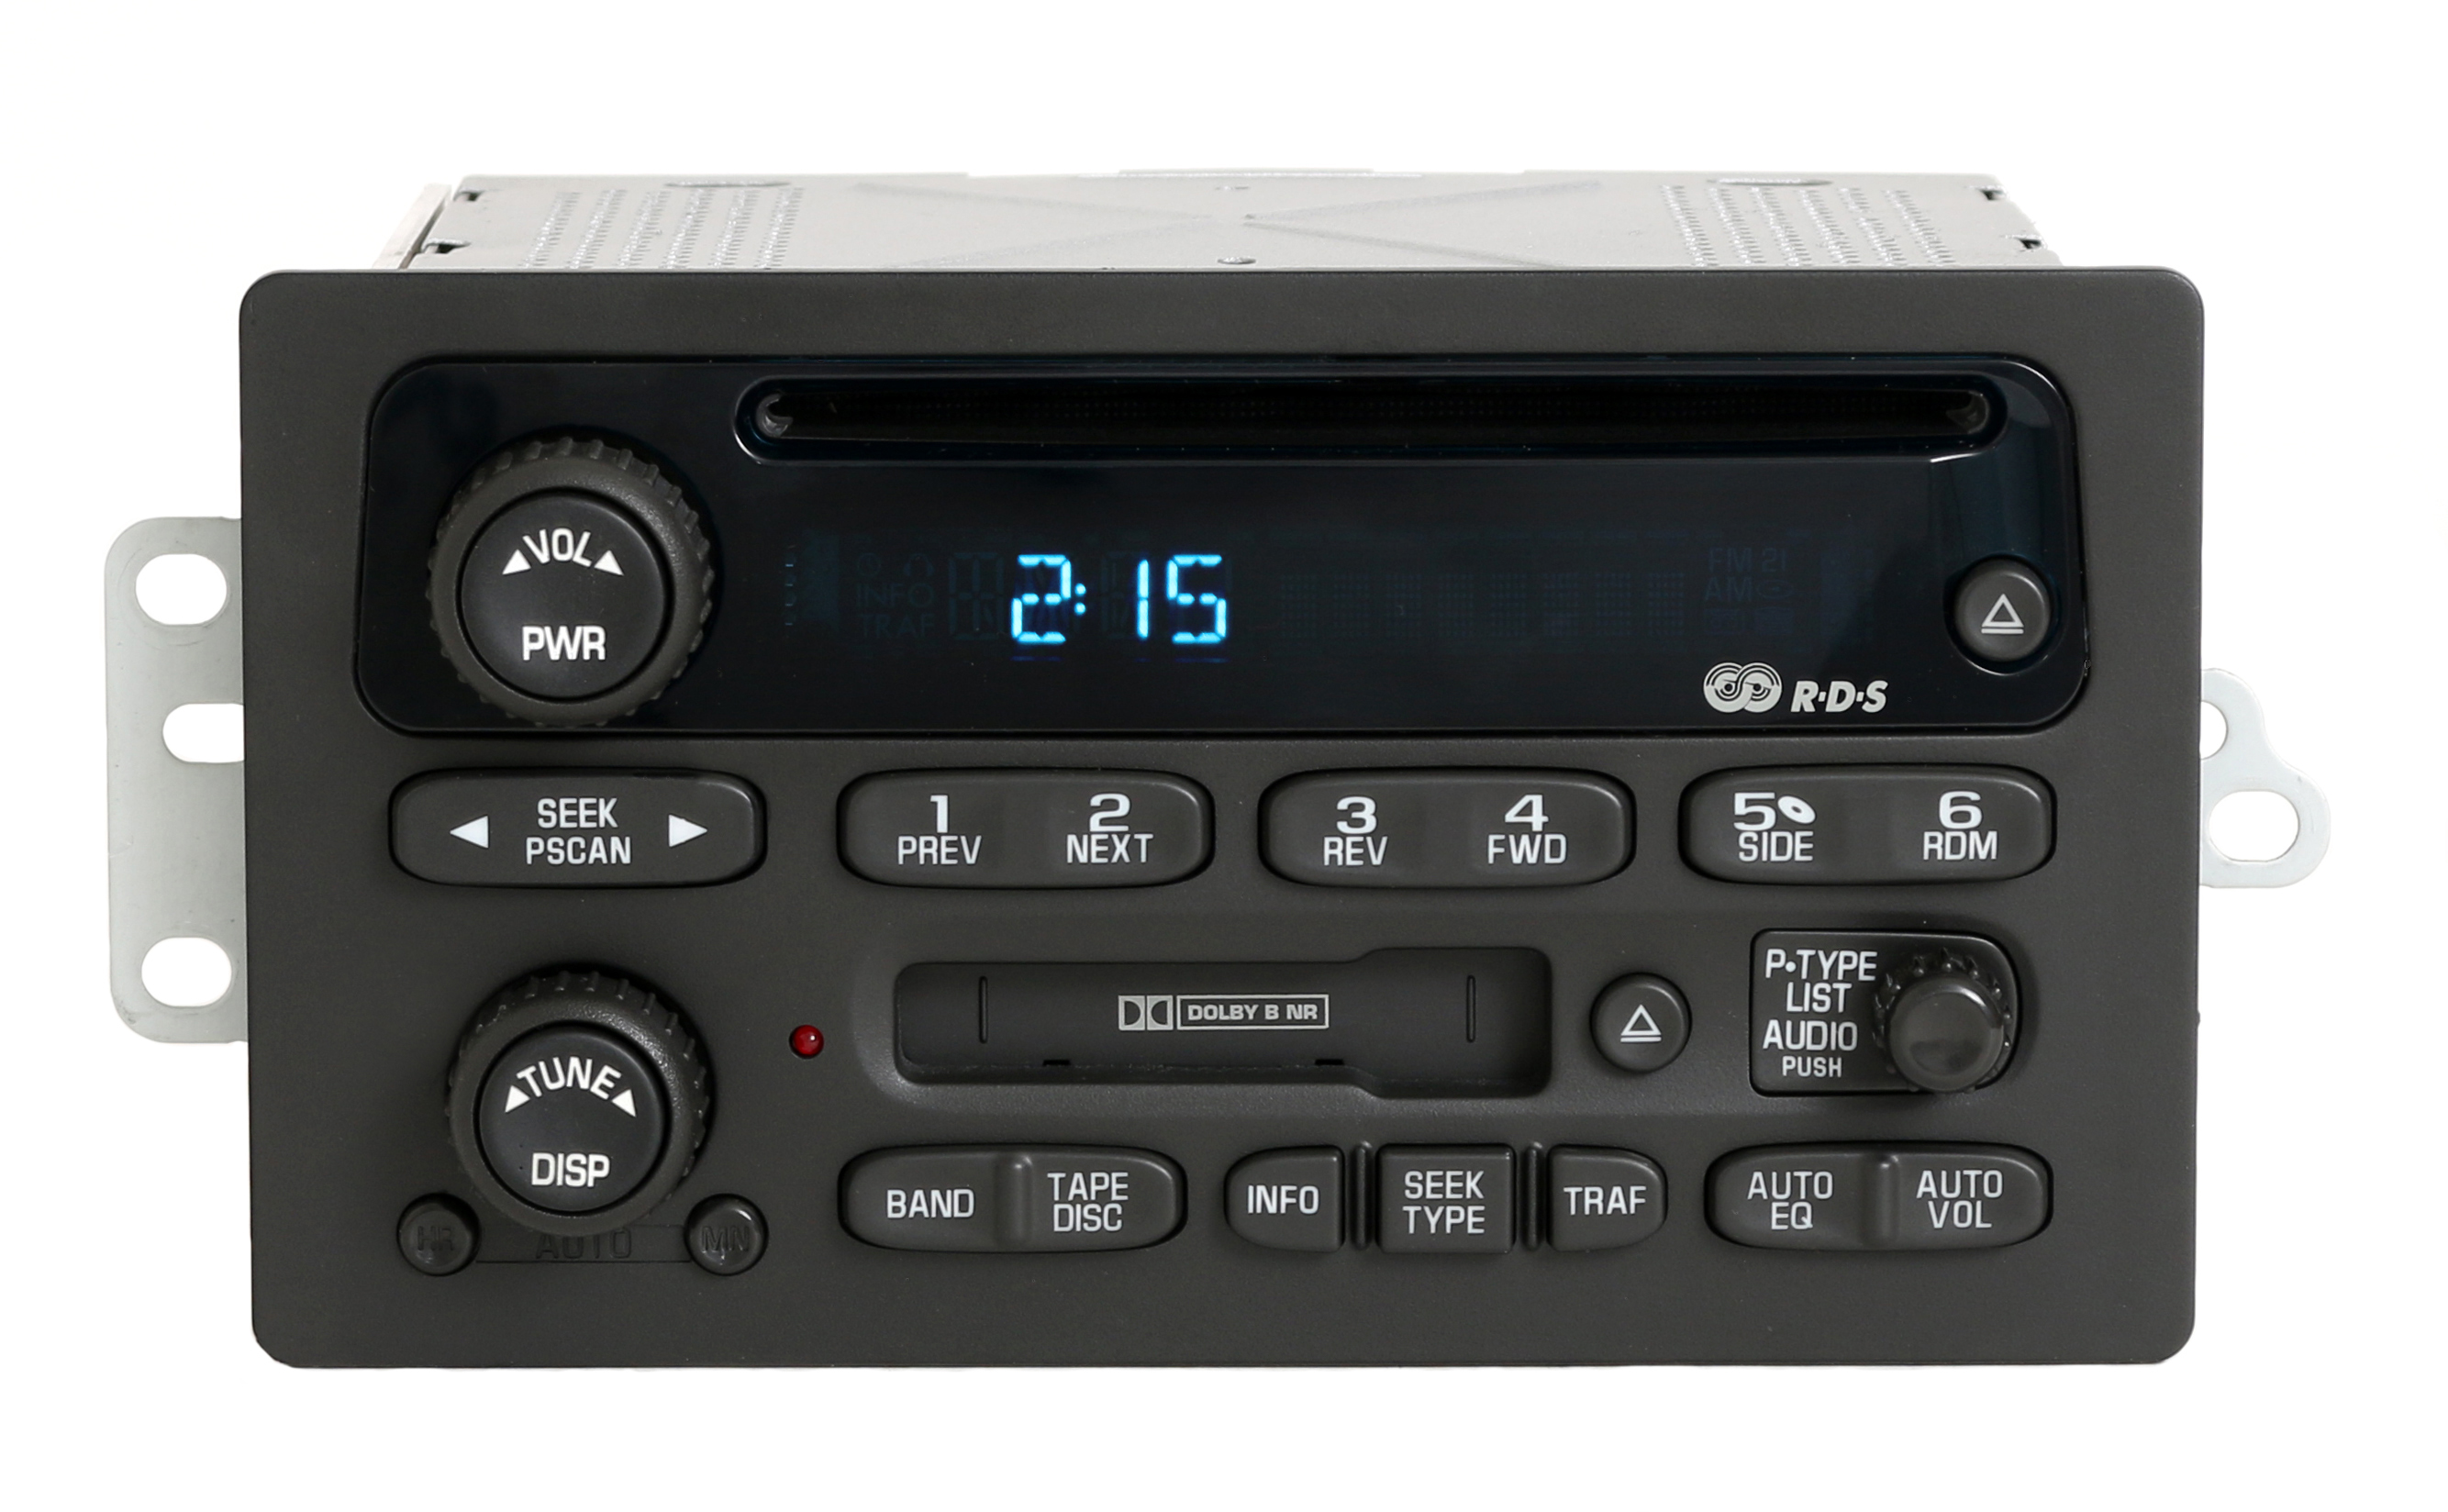 Chevy GMC 2002-03 Trailblazer Envoy Radio AM FM CD Cassette Player PN 15058225 Refurbished by GM